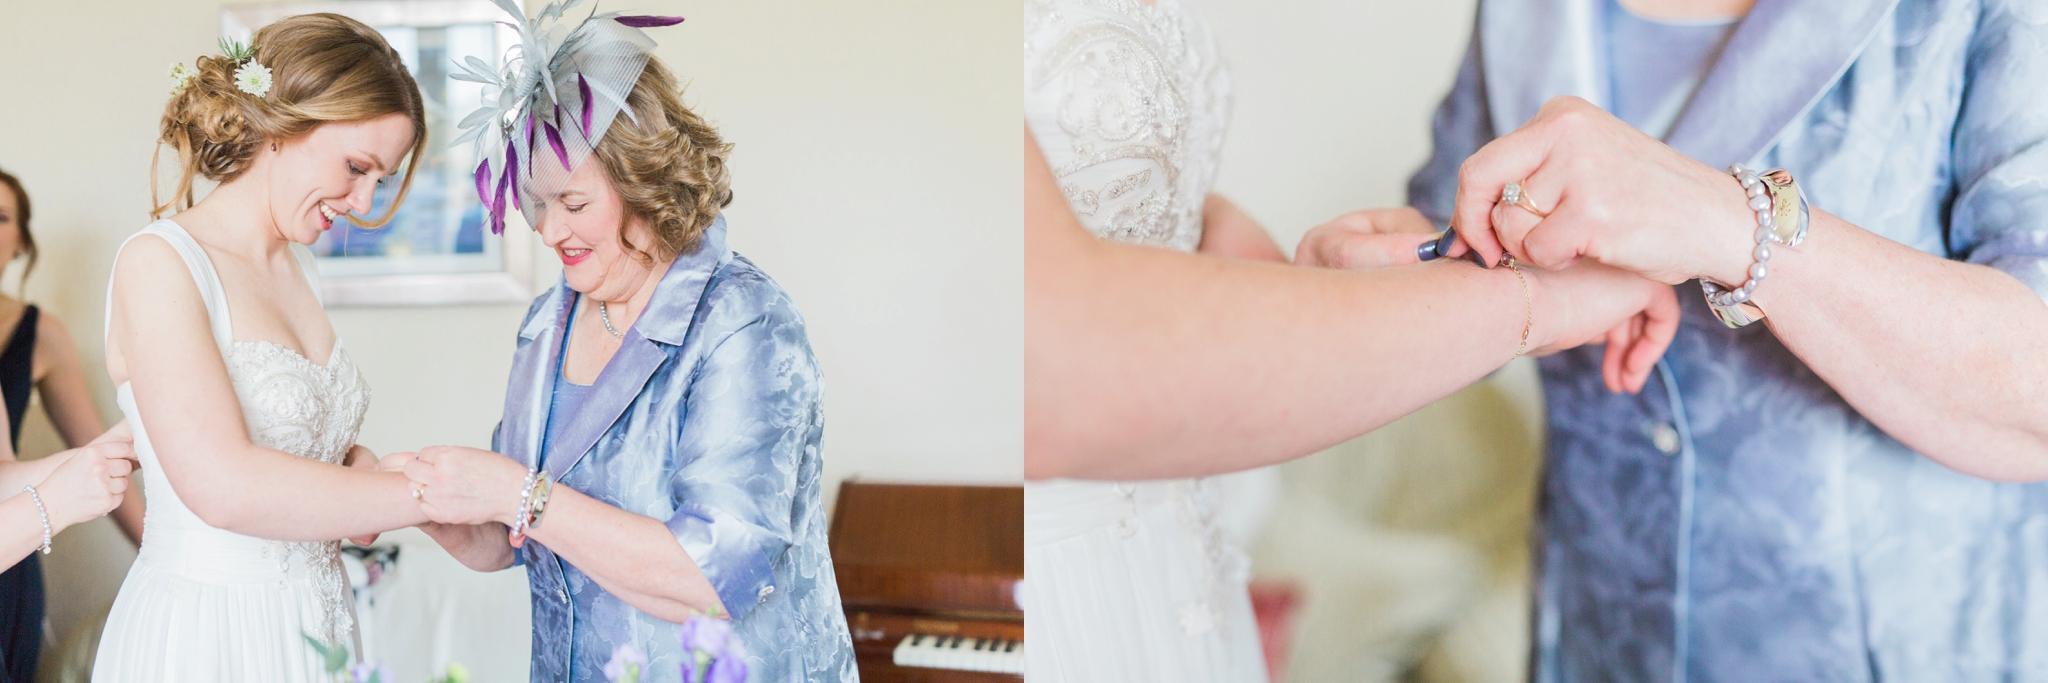 Suzanne_li_photography_kirknewton_wedding_0019.jpg